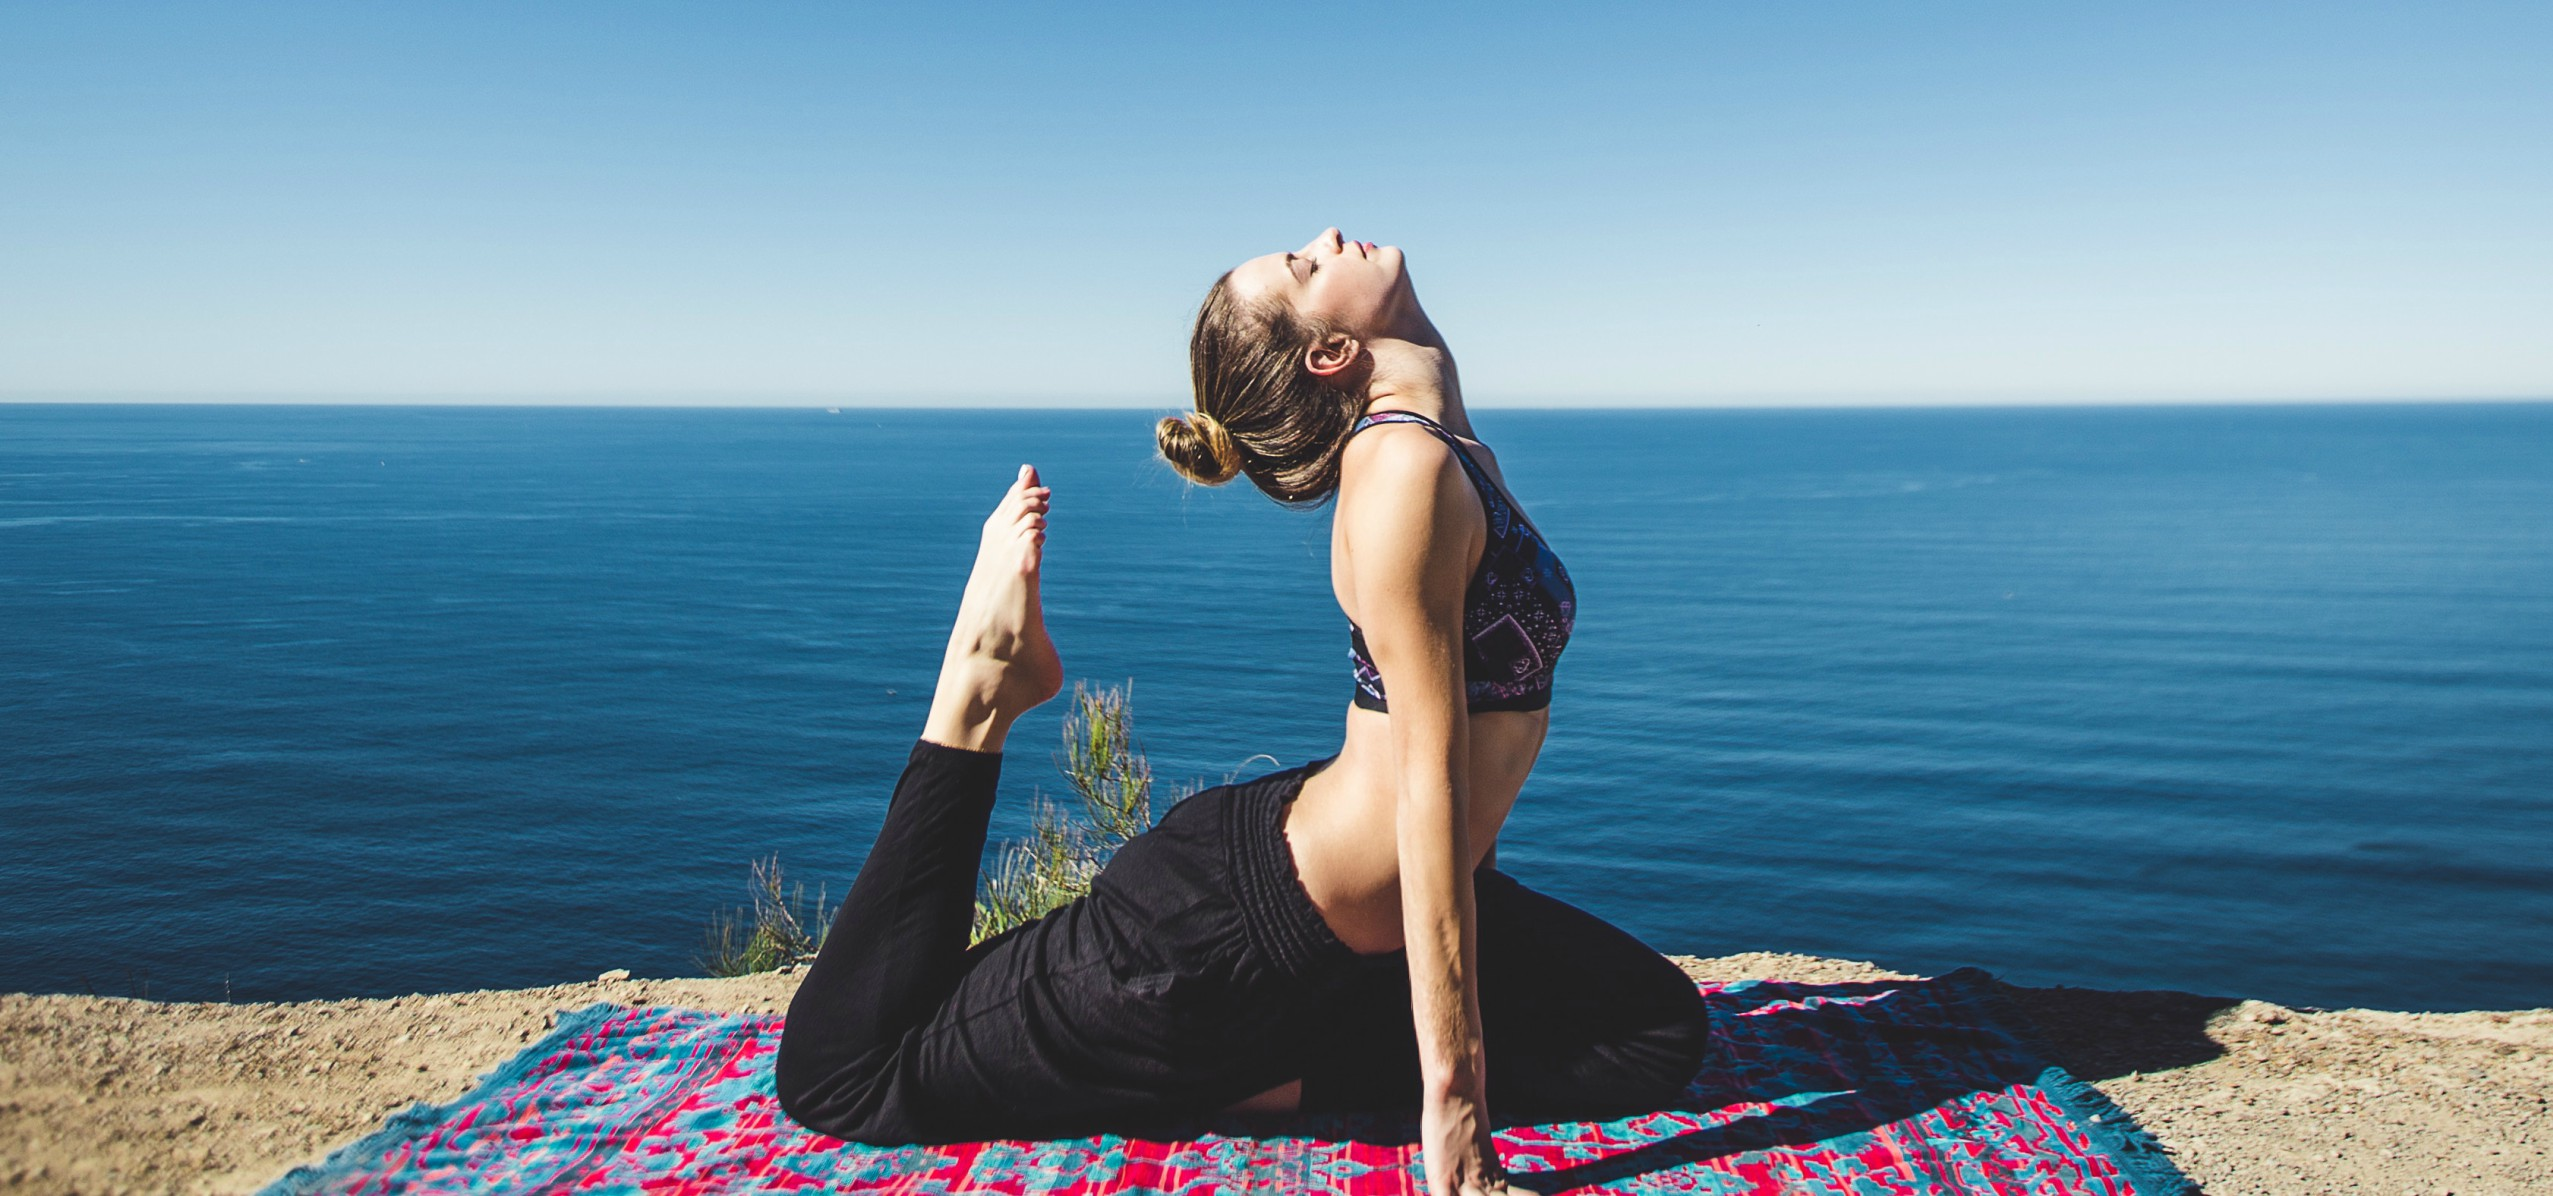 Luxury yoga retreat experience in Jávea